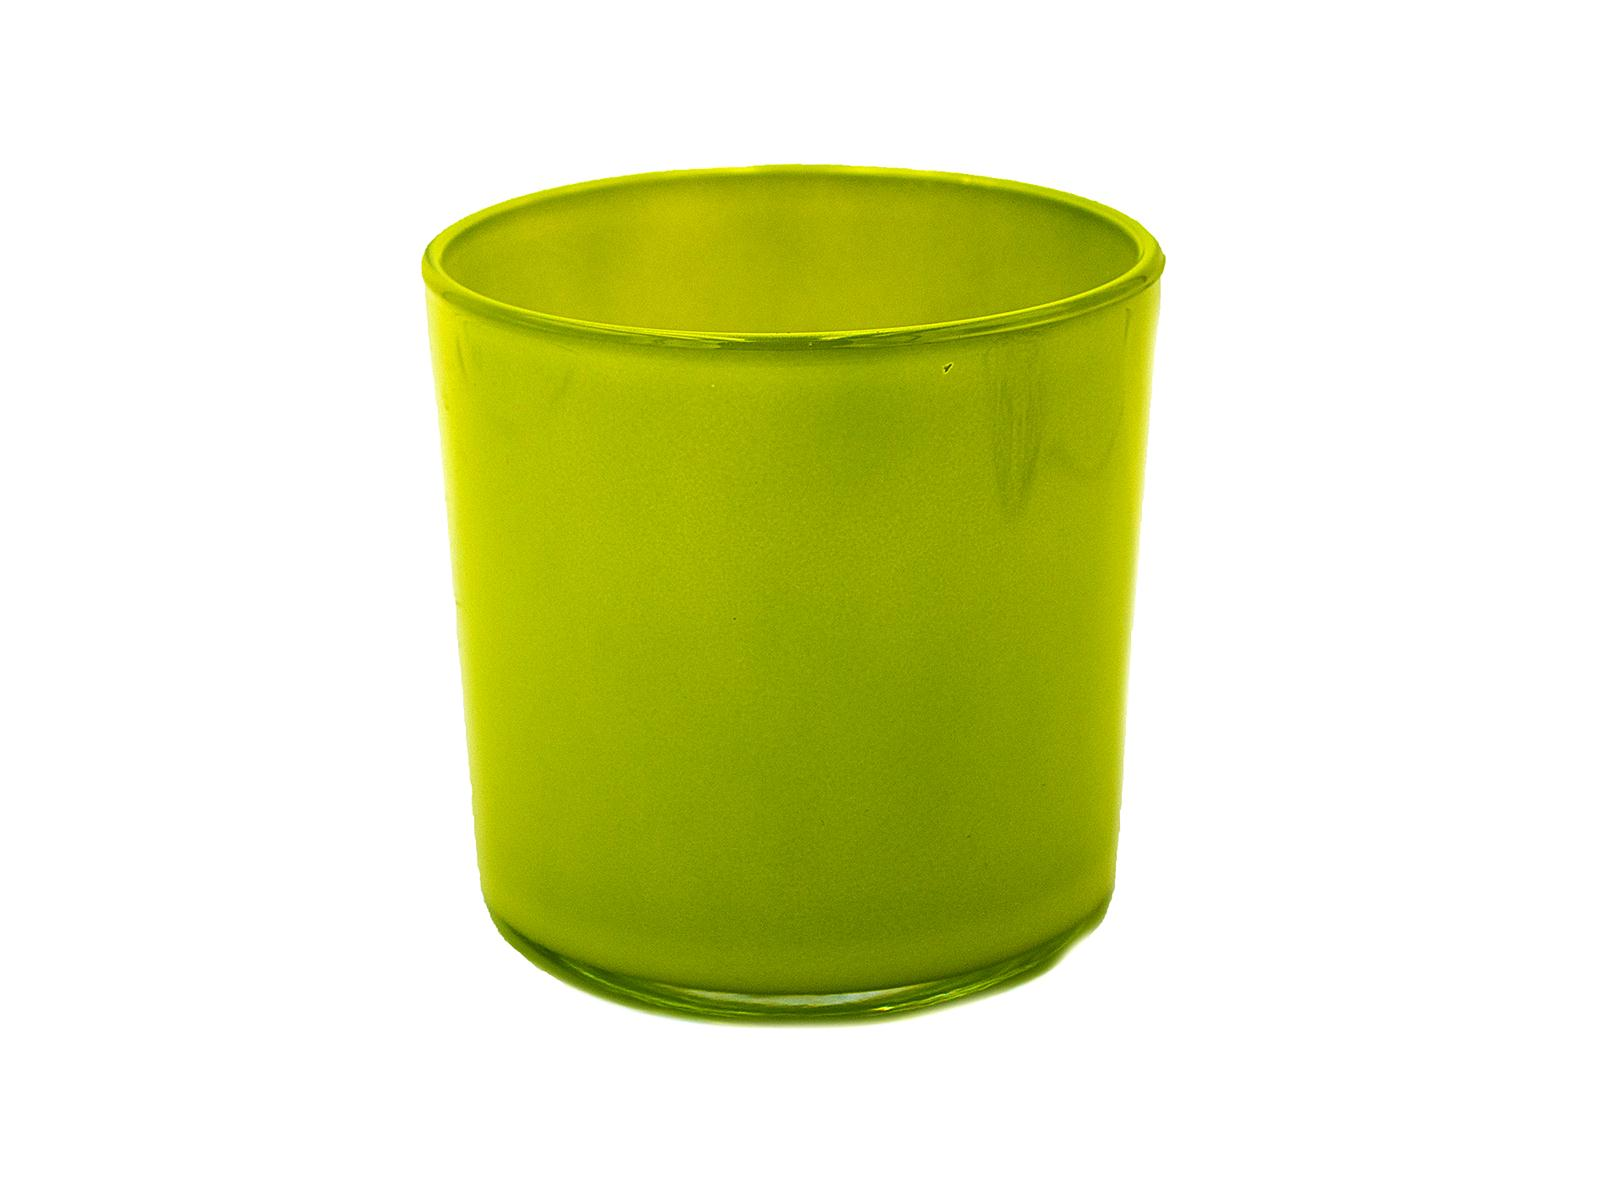 Blumentopf Davinci, Glas grün, H 13, D 13